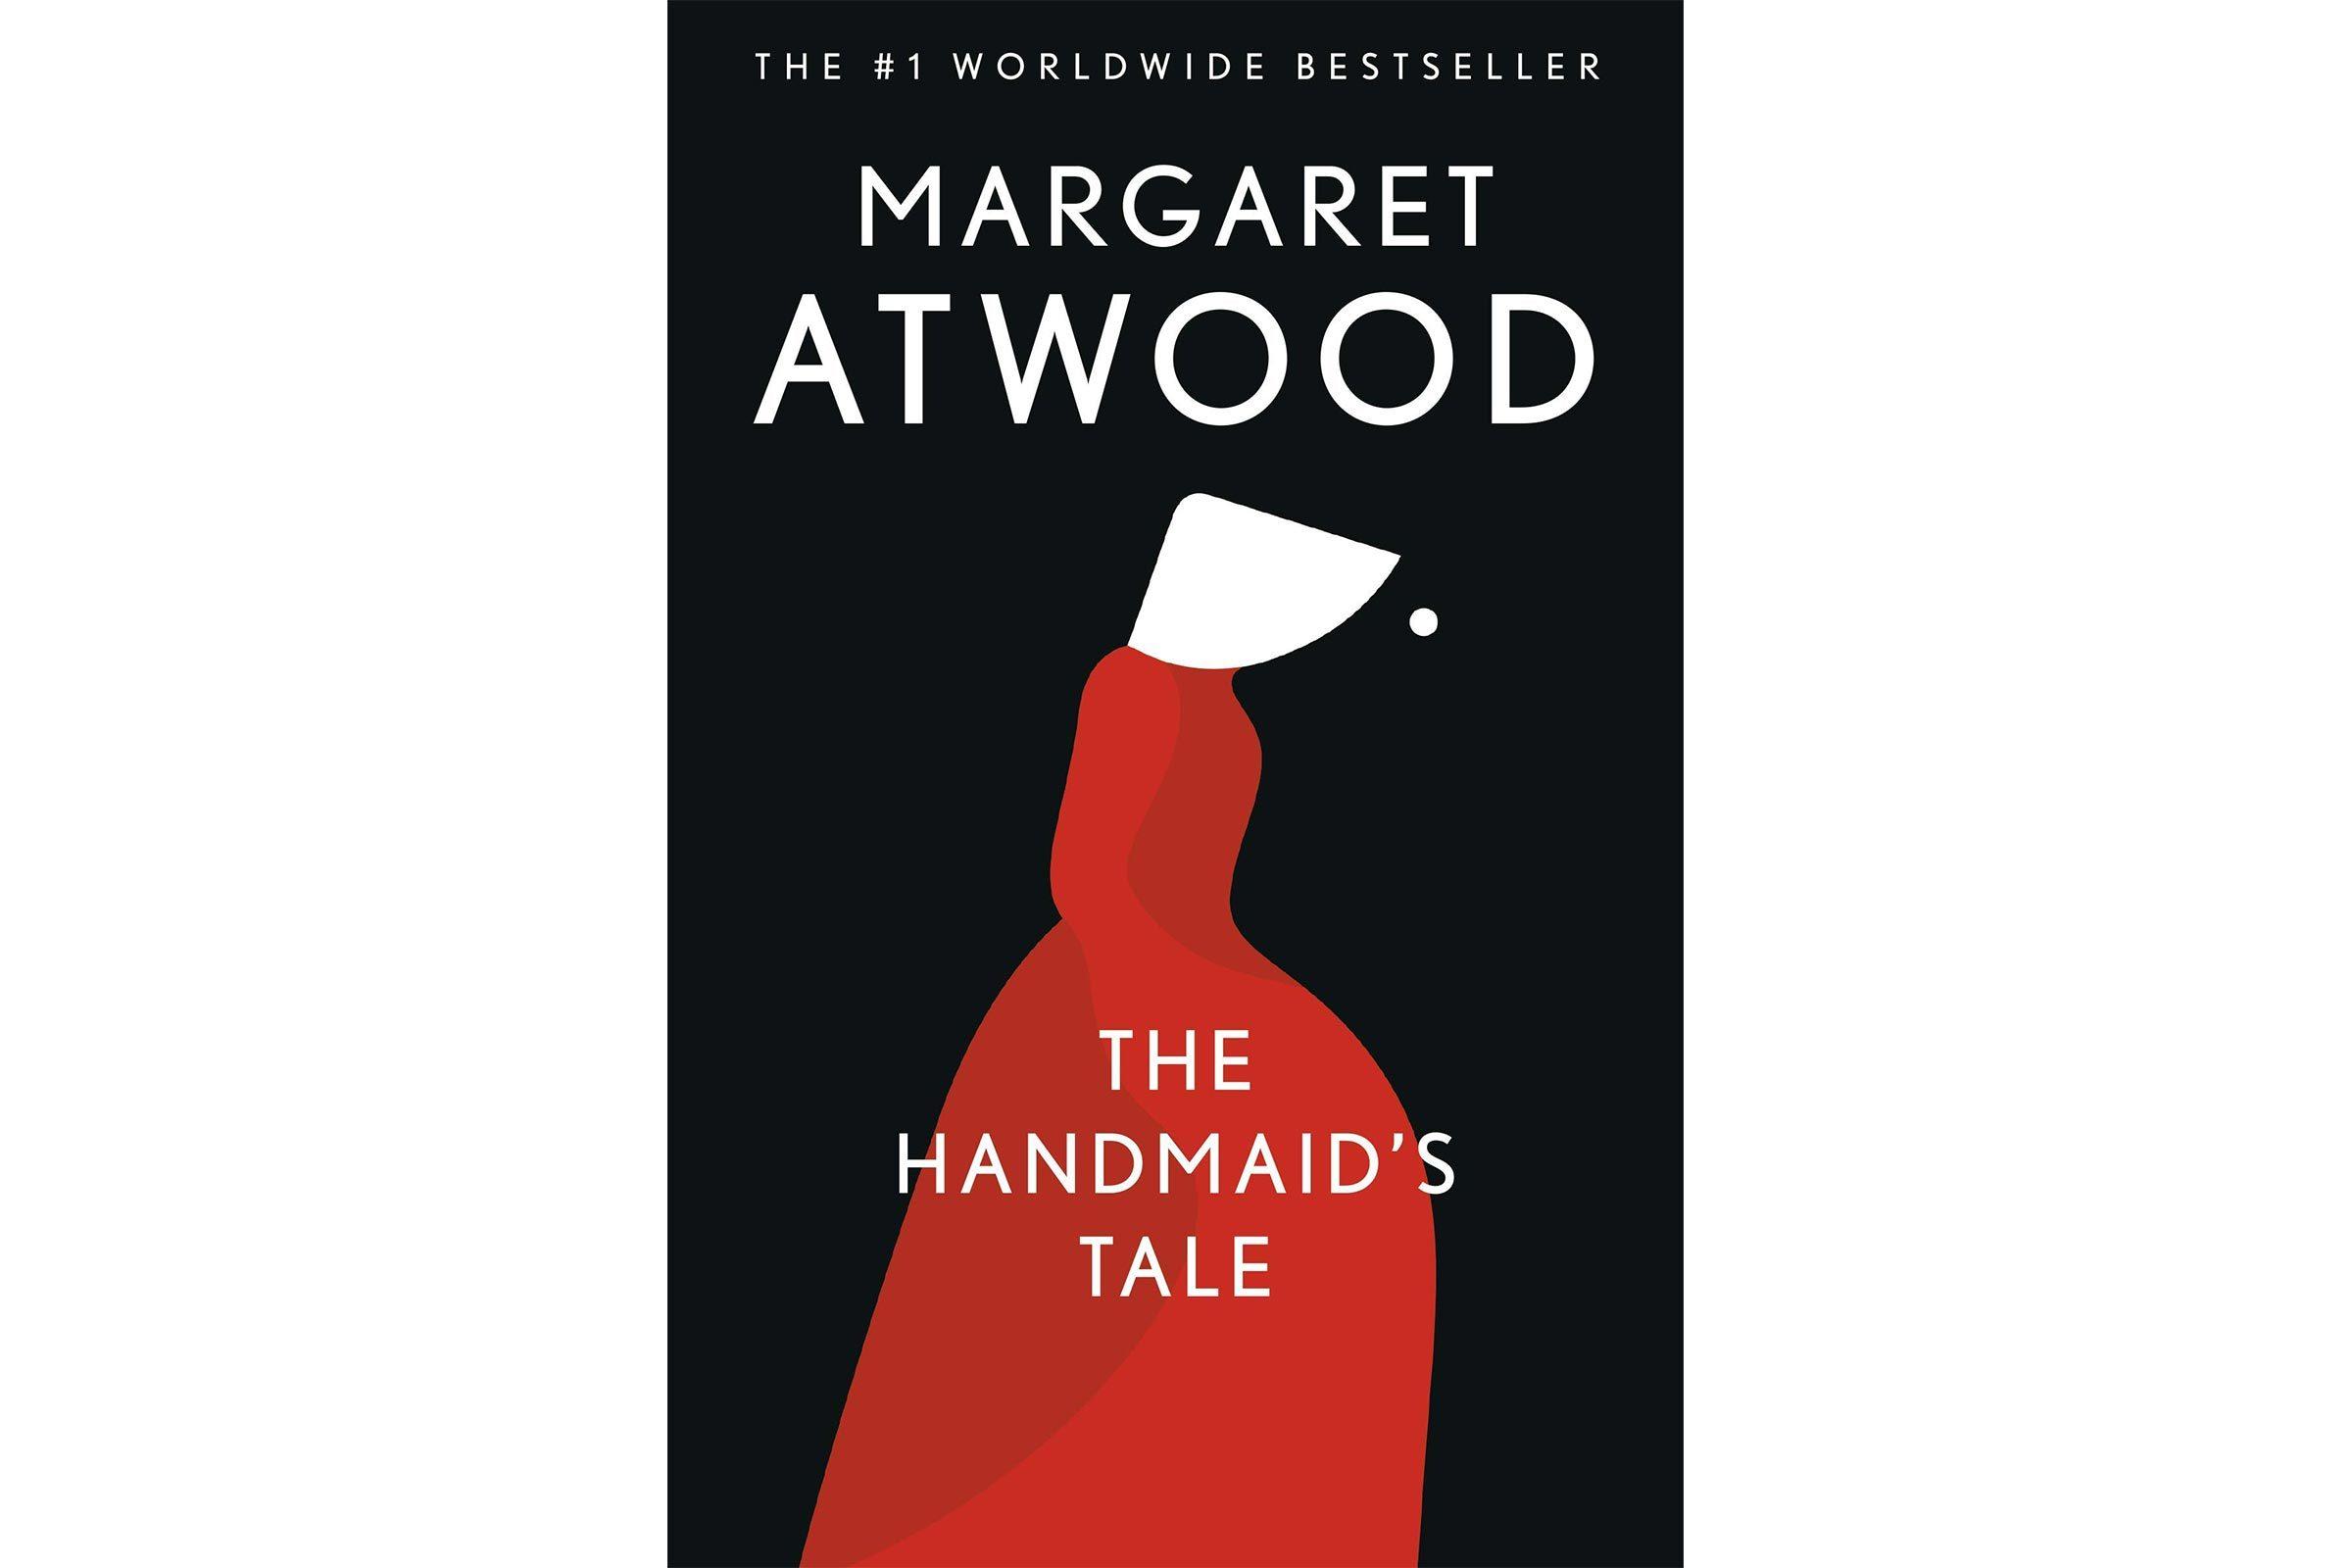 09_The-Handmaid's-Tale